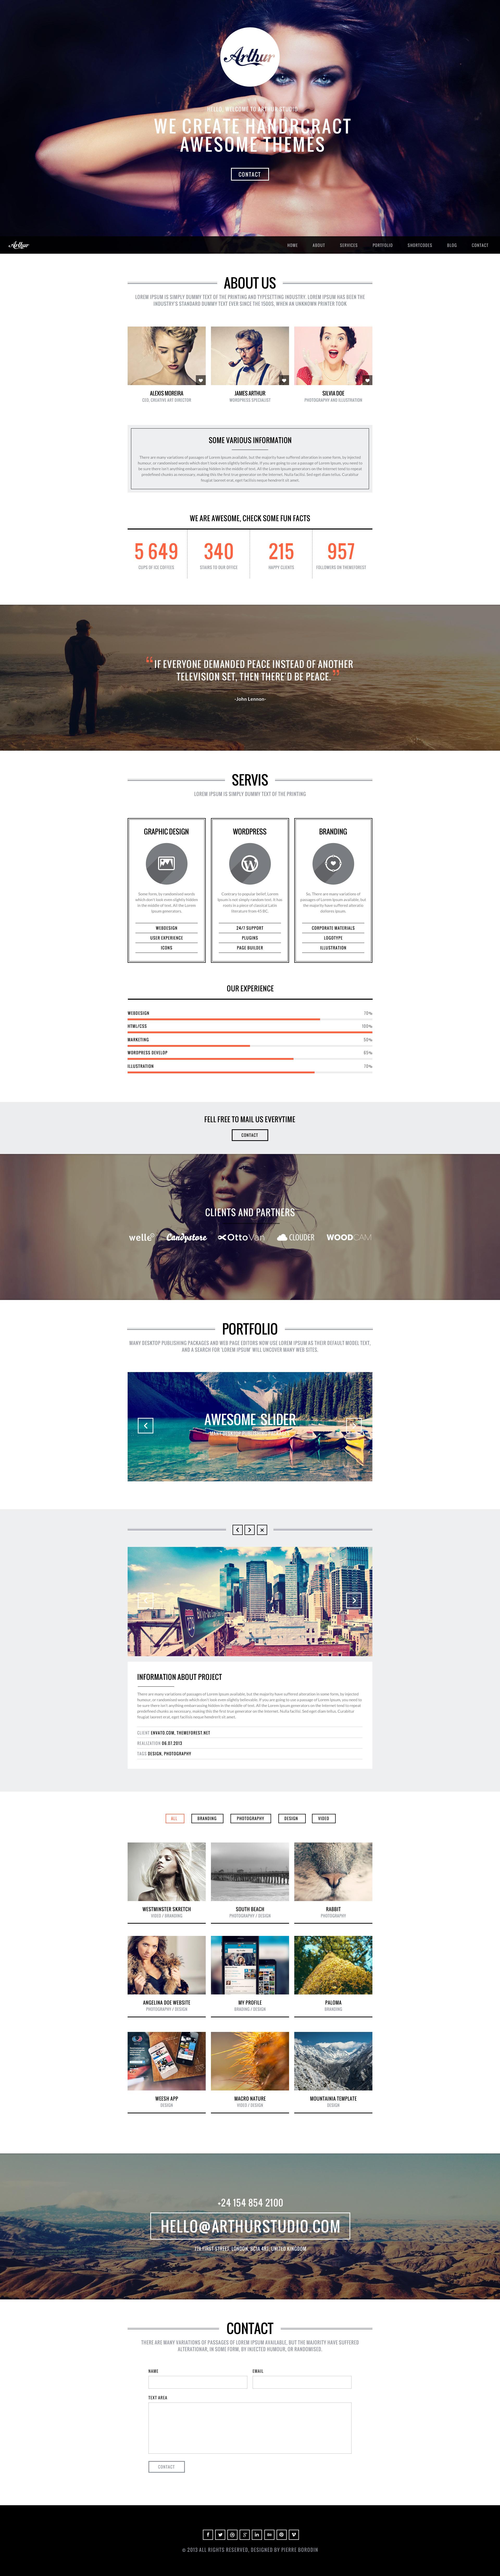 Arthur - PSD parallax portfolio